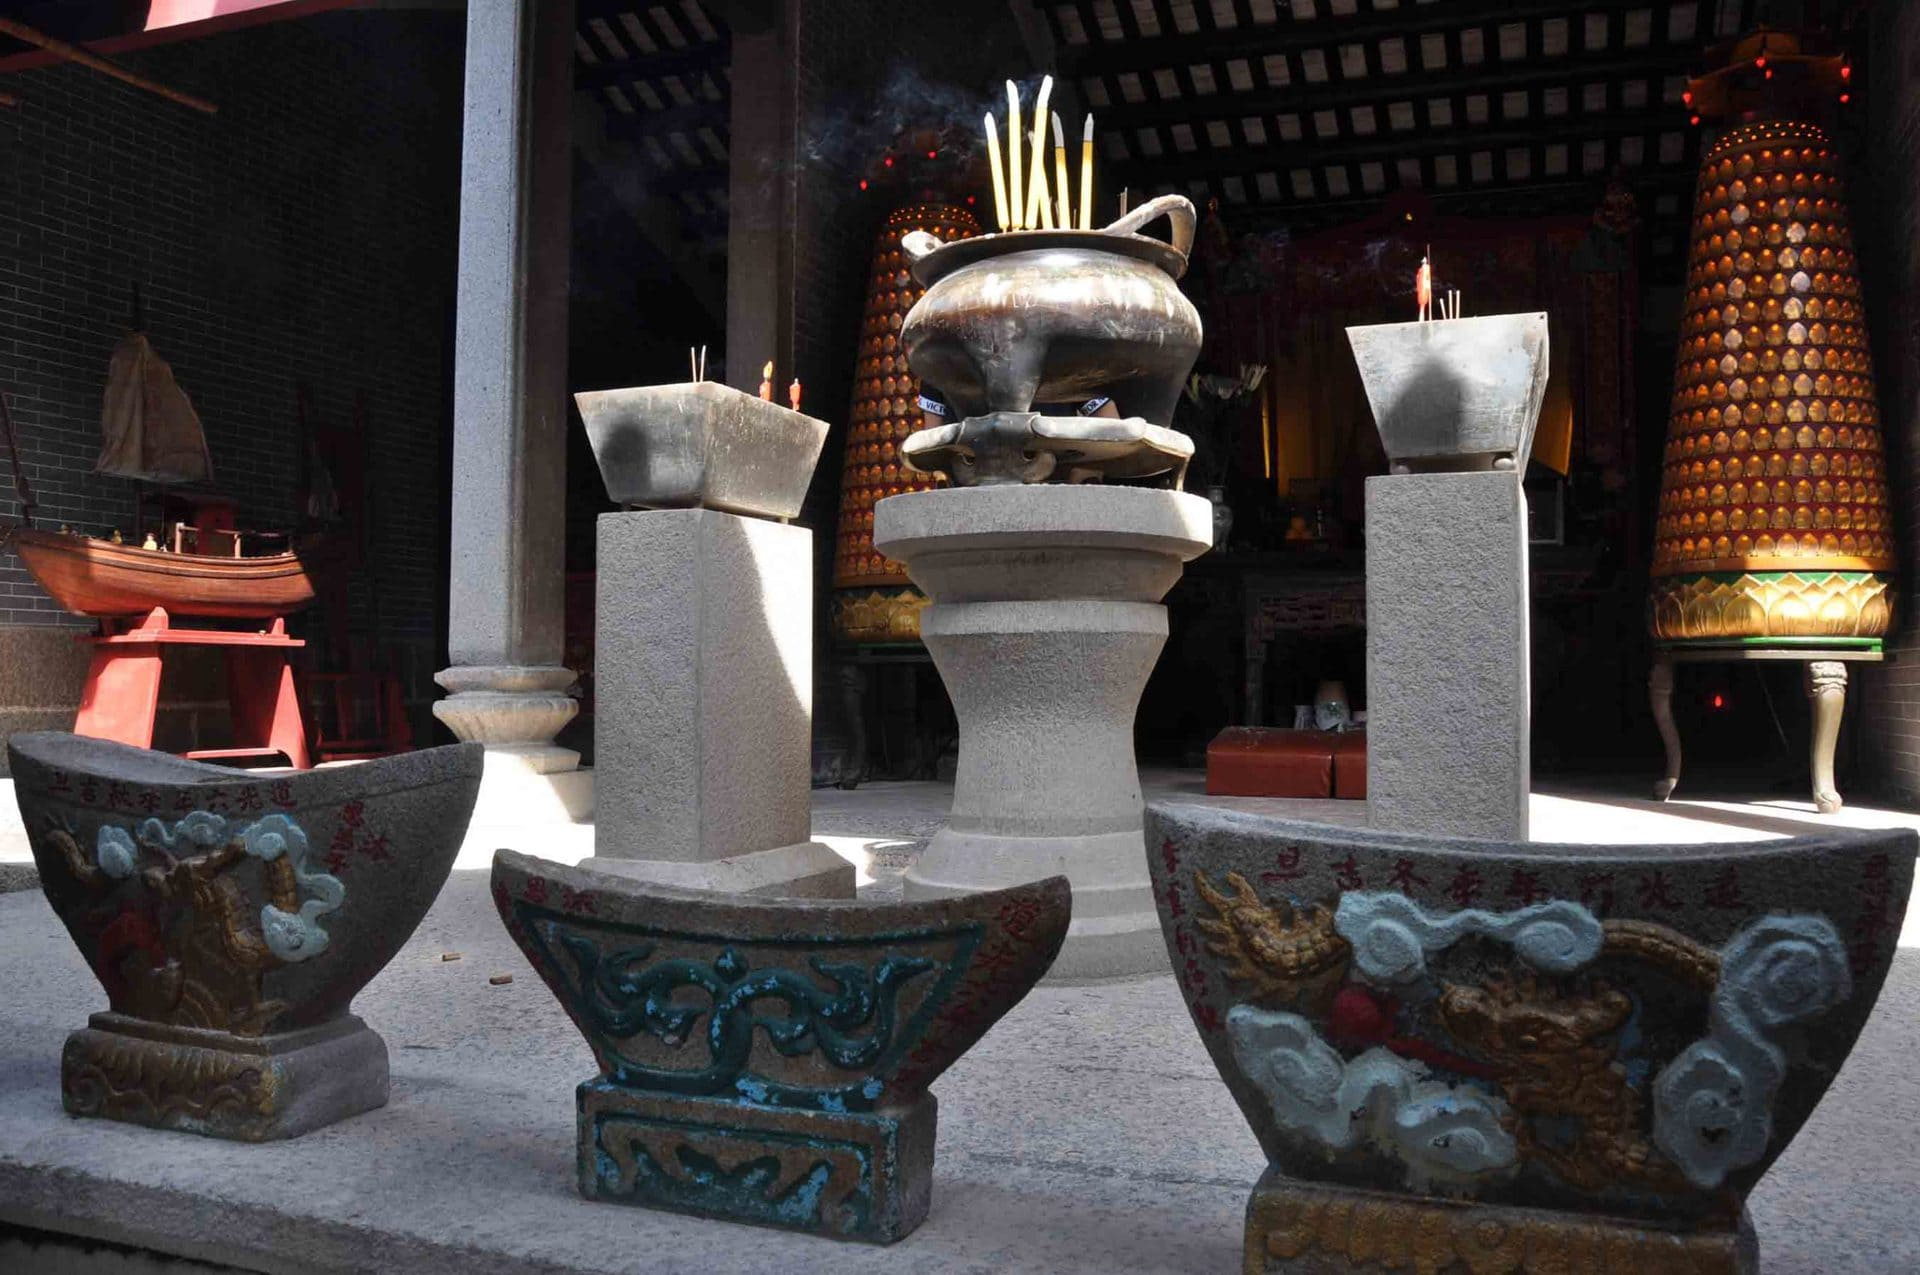 Tin Hau Temple wine boats